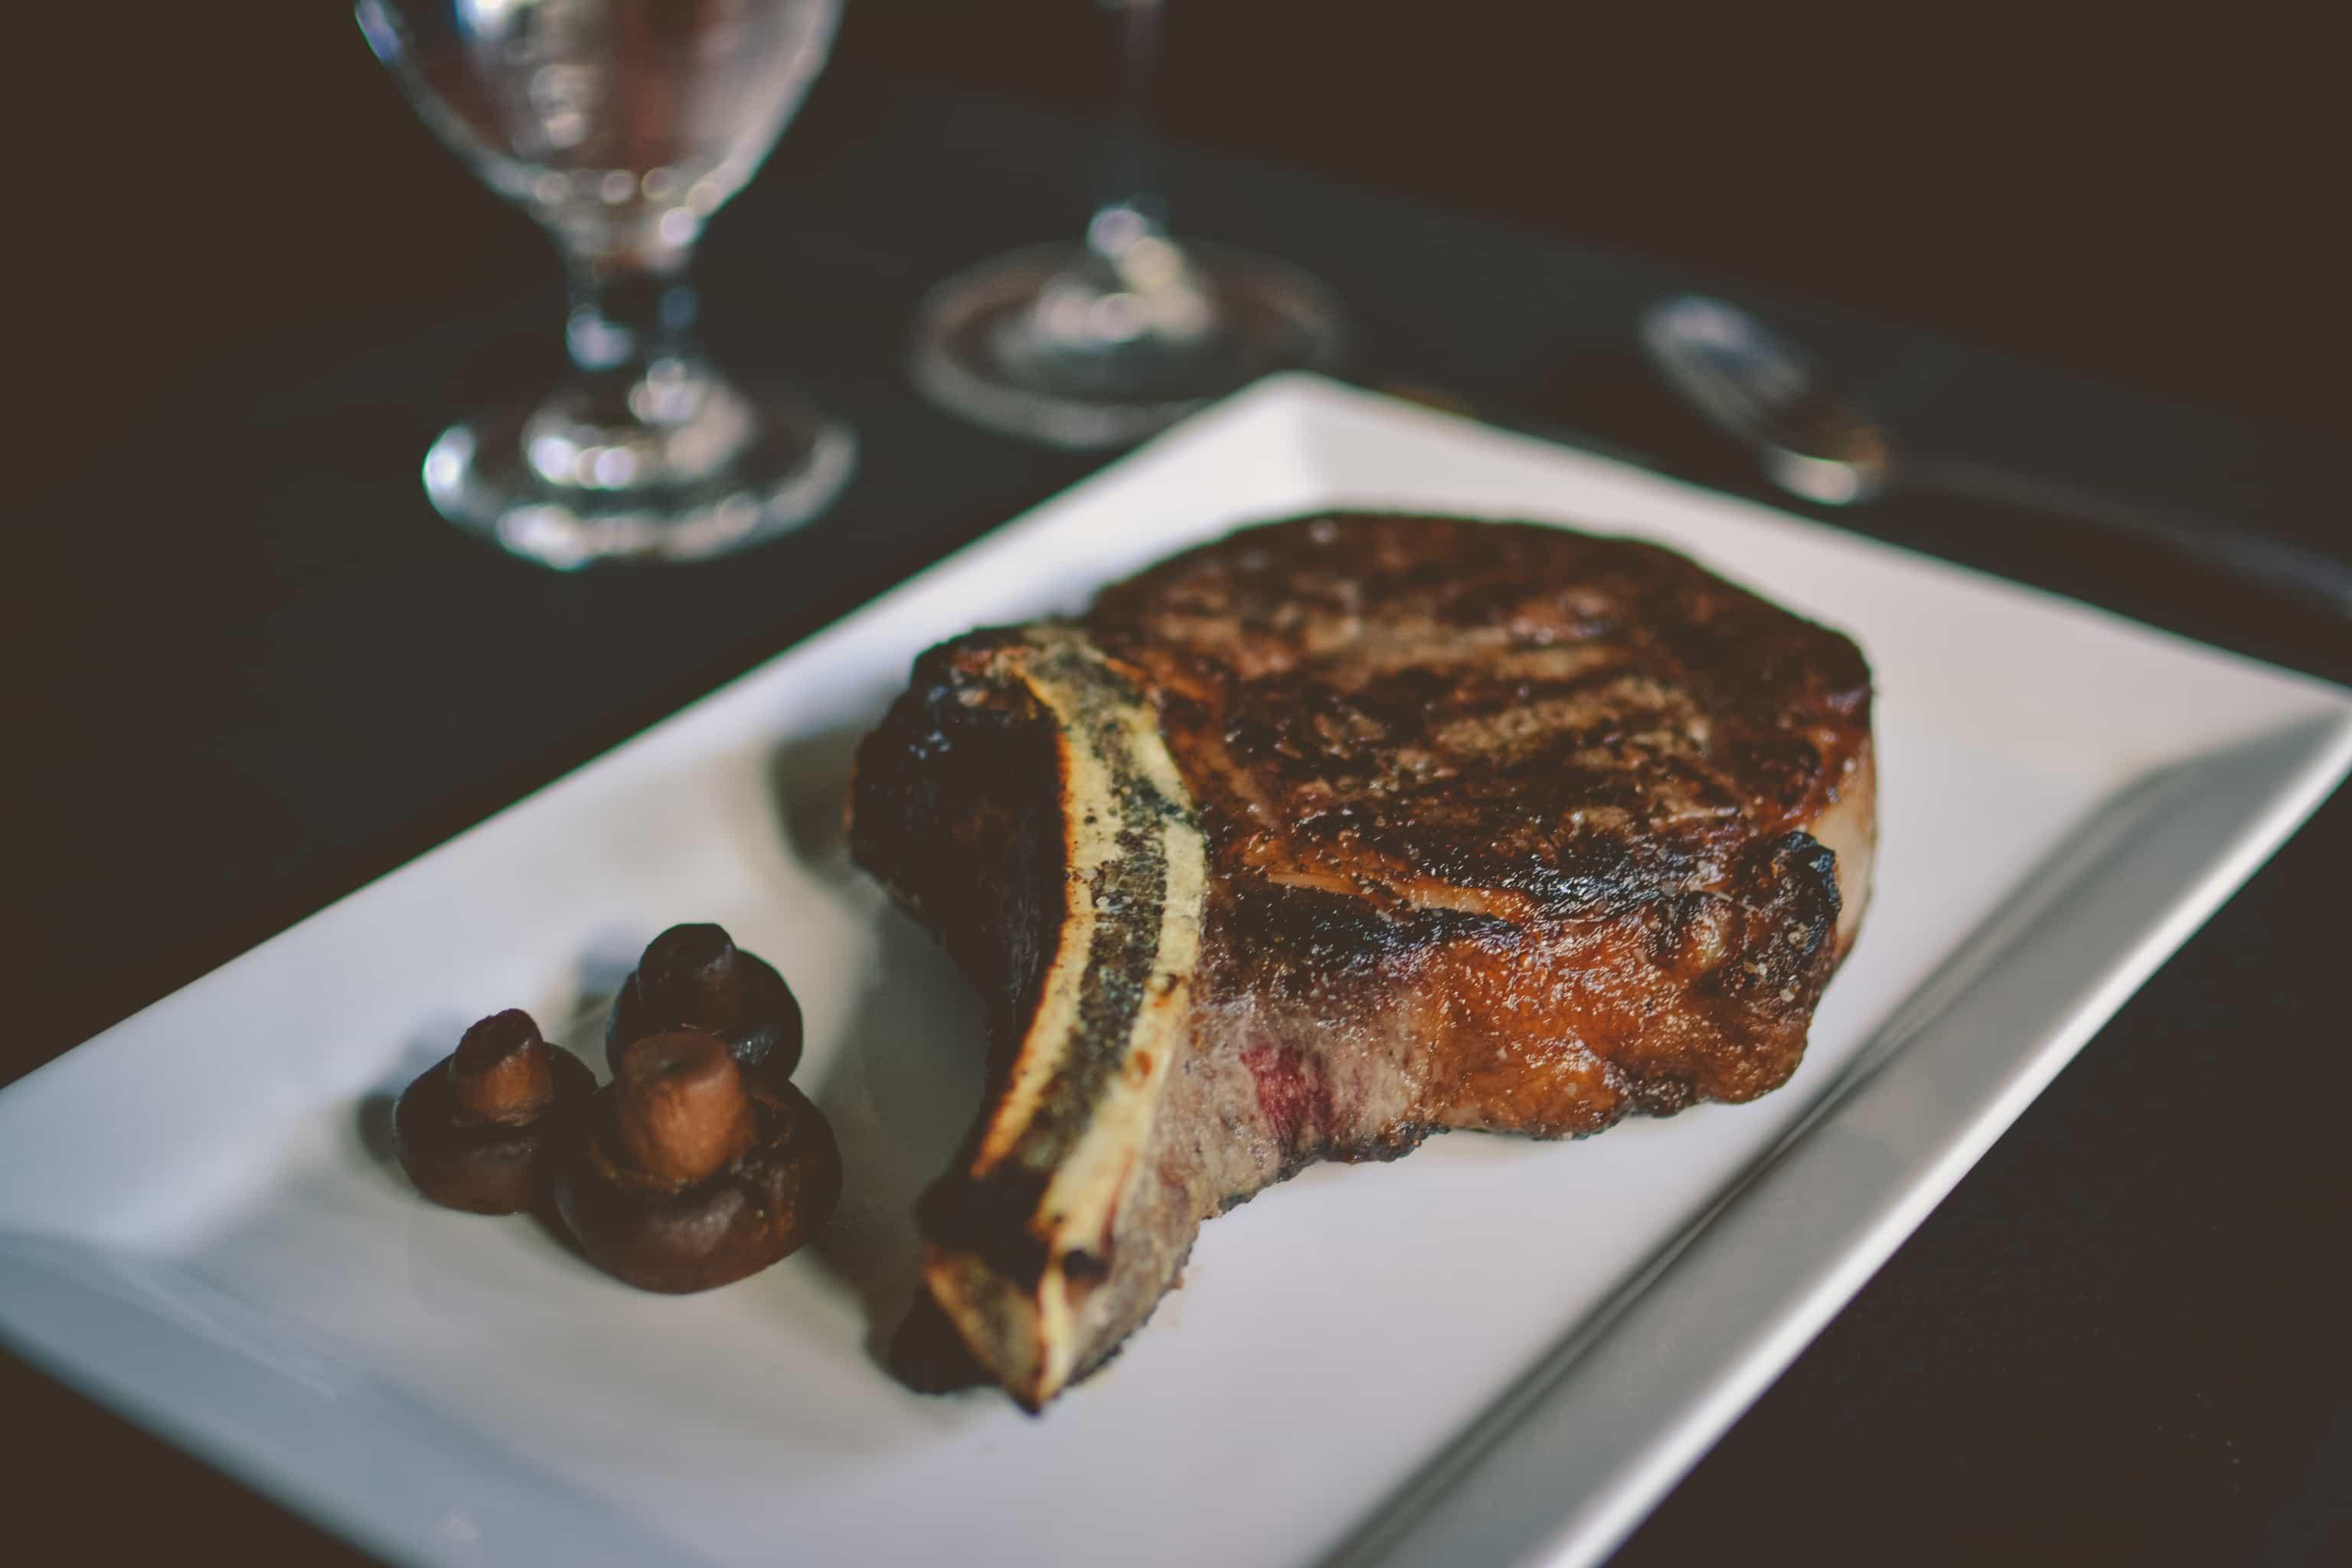 menomonee falls steakhouse- johnny manhattan's